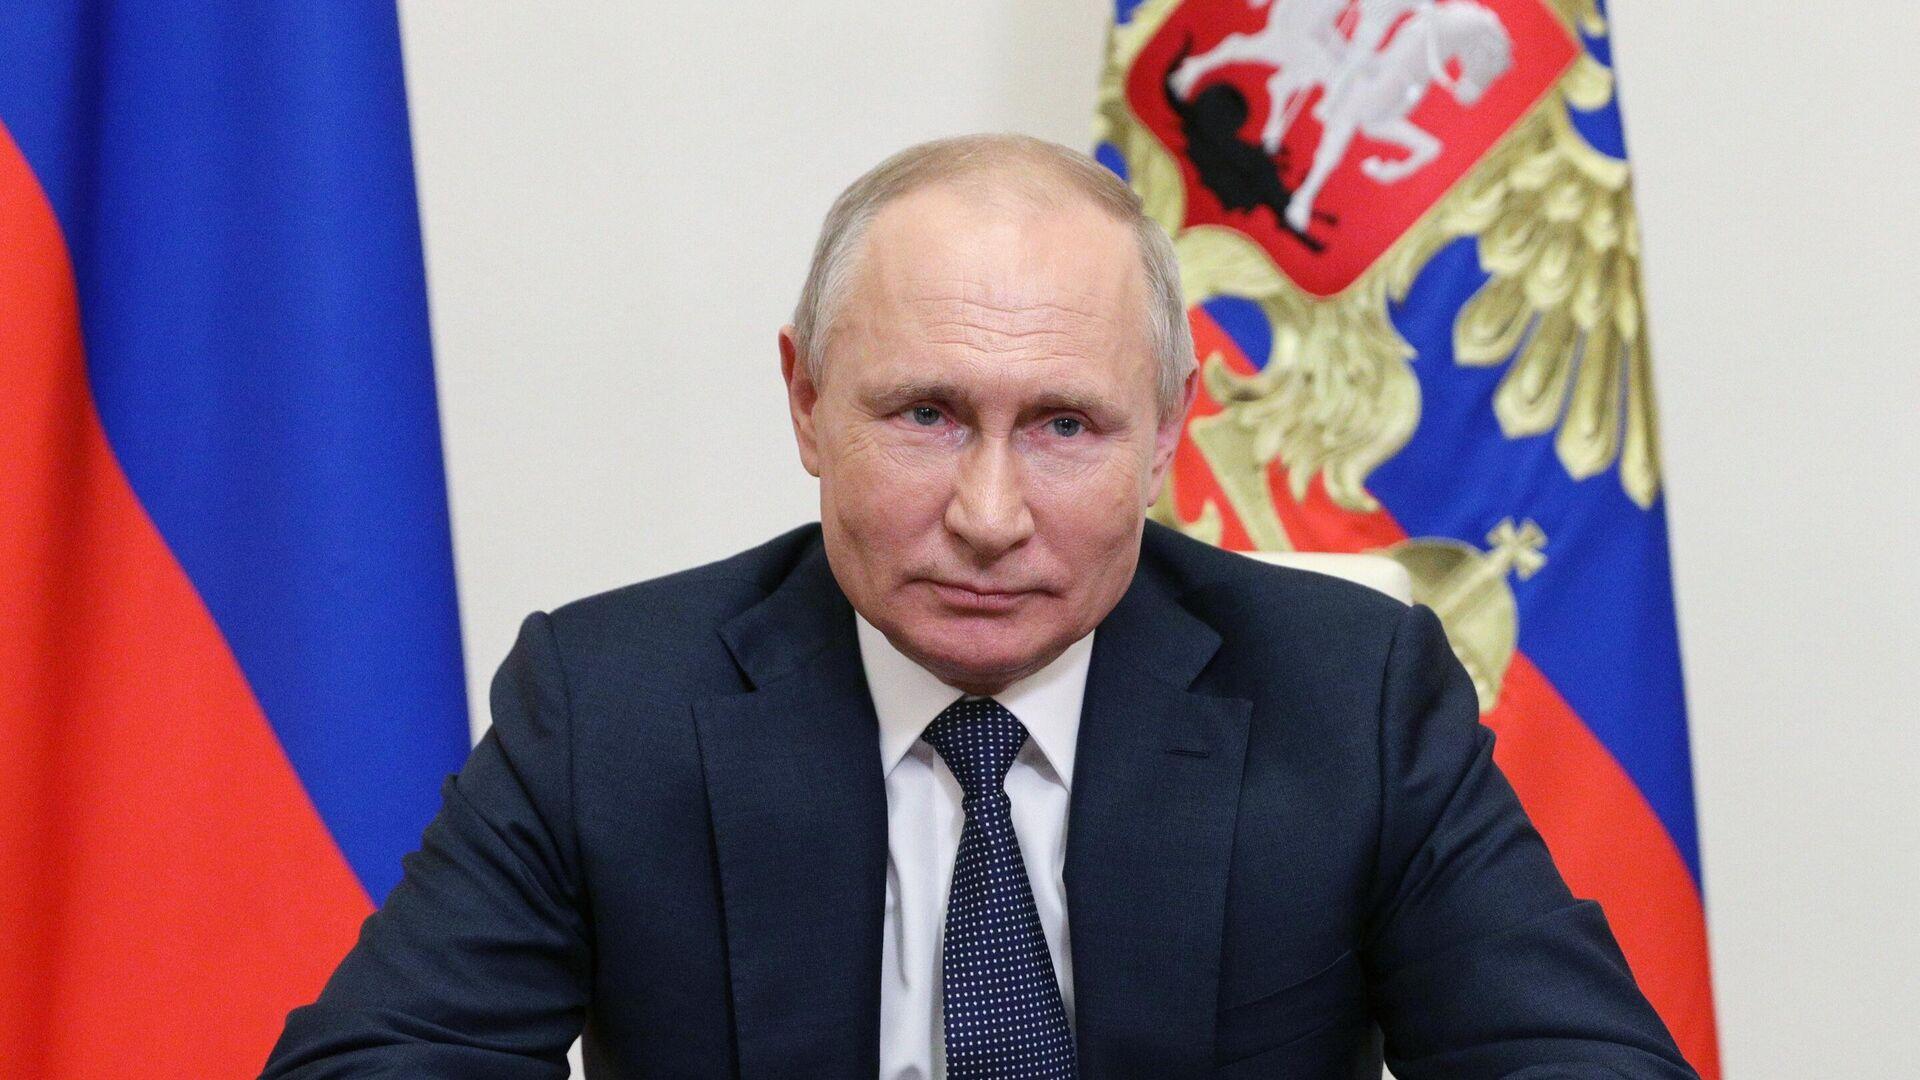 Vladímir Putin, presidente de Rusia - Sputnik Mundo, 1920, 24.06.2021